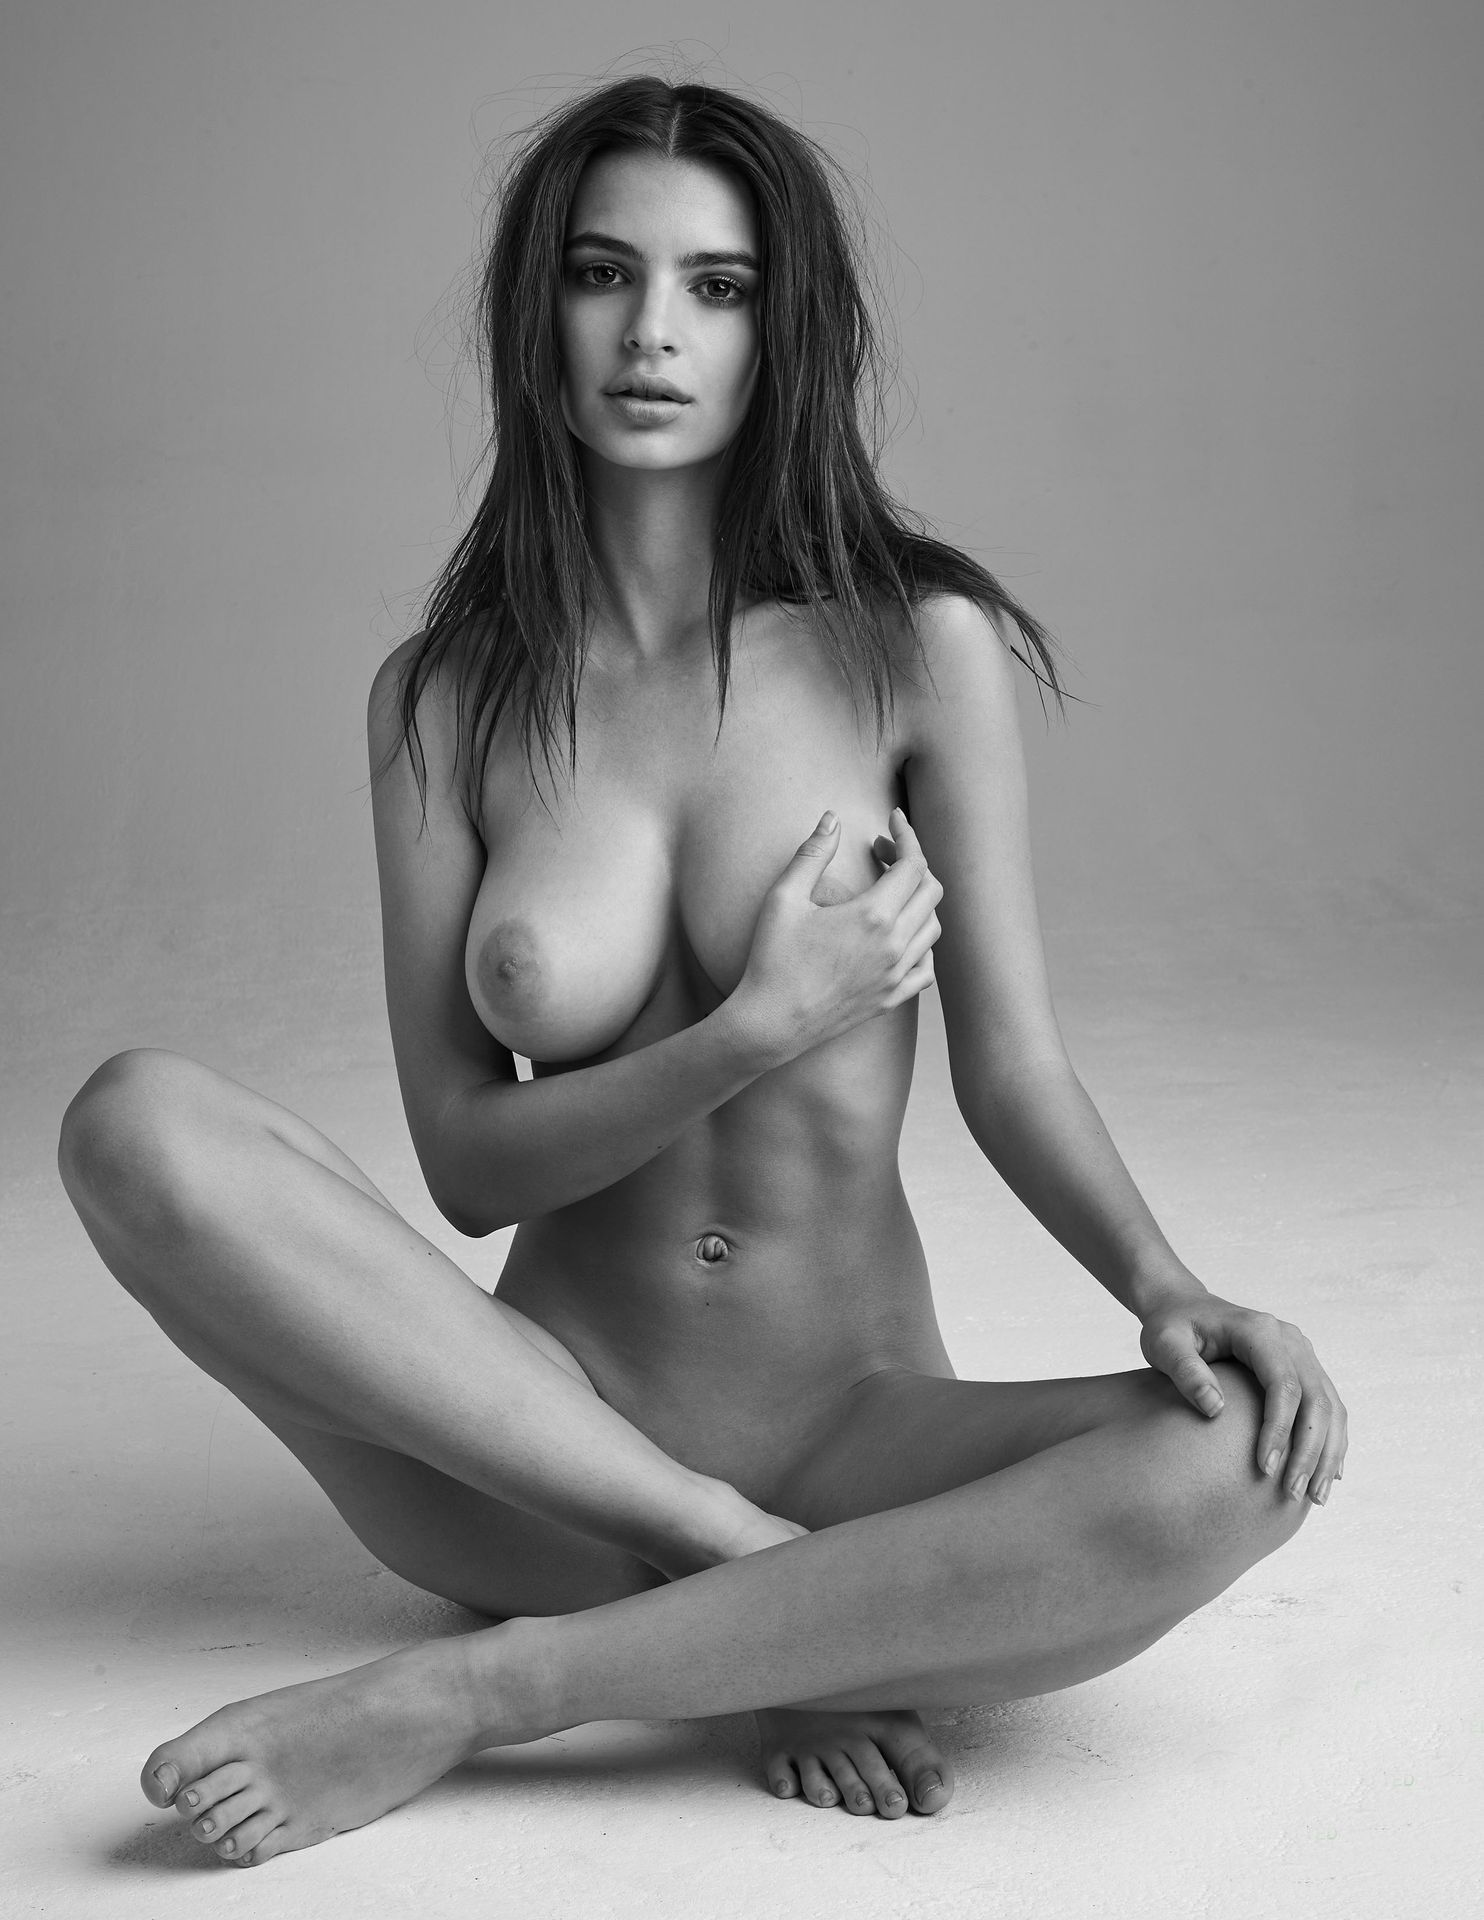 Emily-Ratajkowski-Nude-3-thefappeningblog.com_.jpg